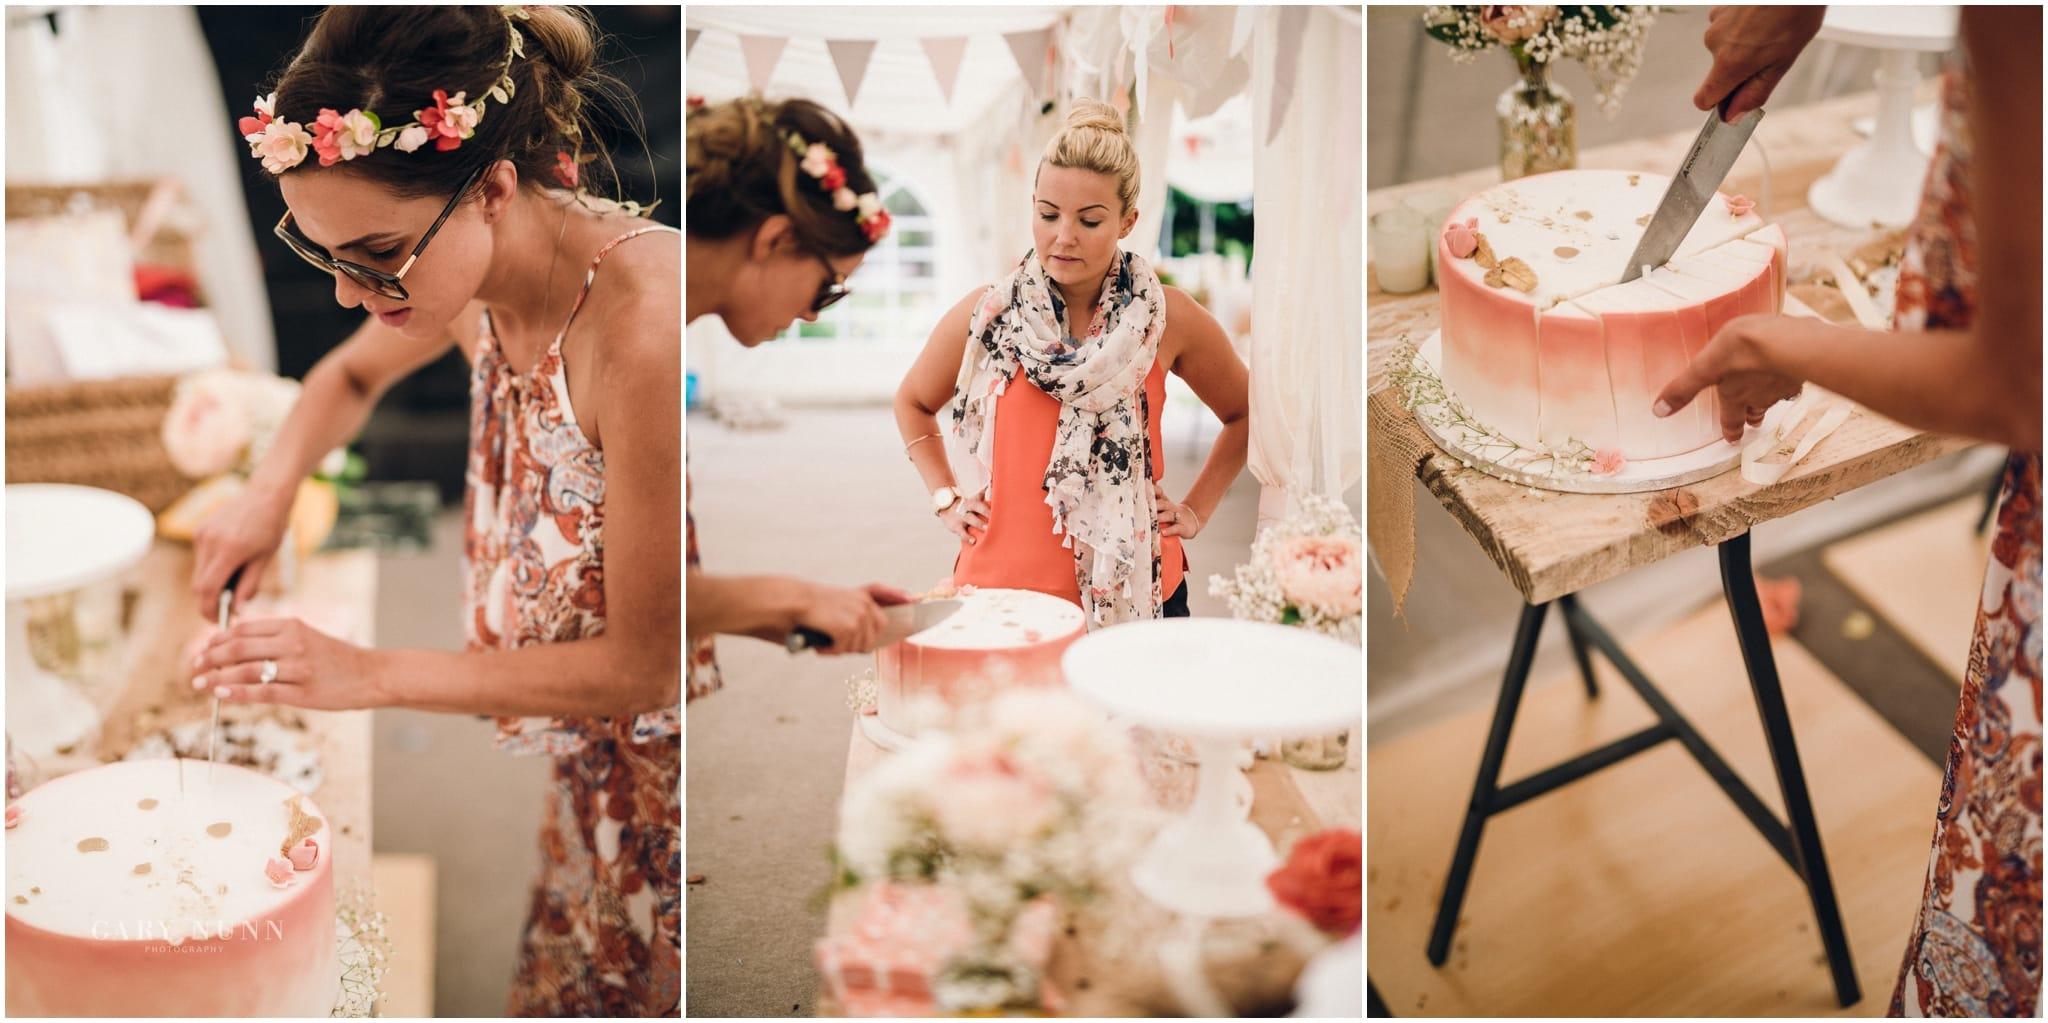 Milton Keynes Wedding Photographer, Wedding Photographer Leighton Buzzard, Destination Wedding Photographer, Buckingham Wedding Photographer